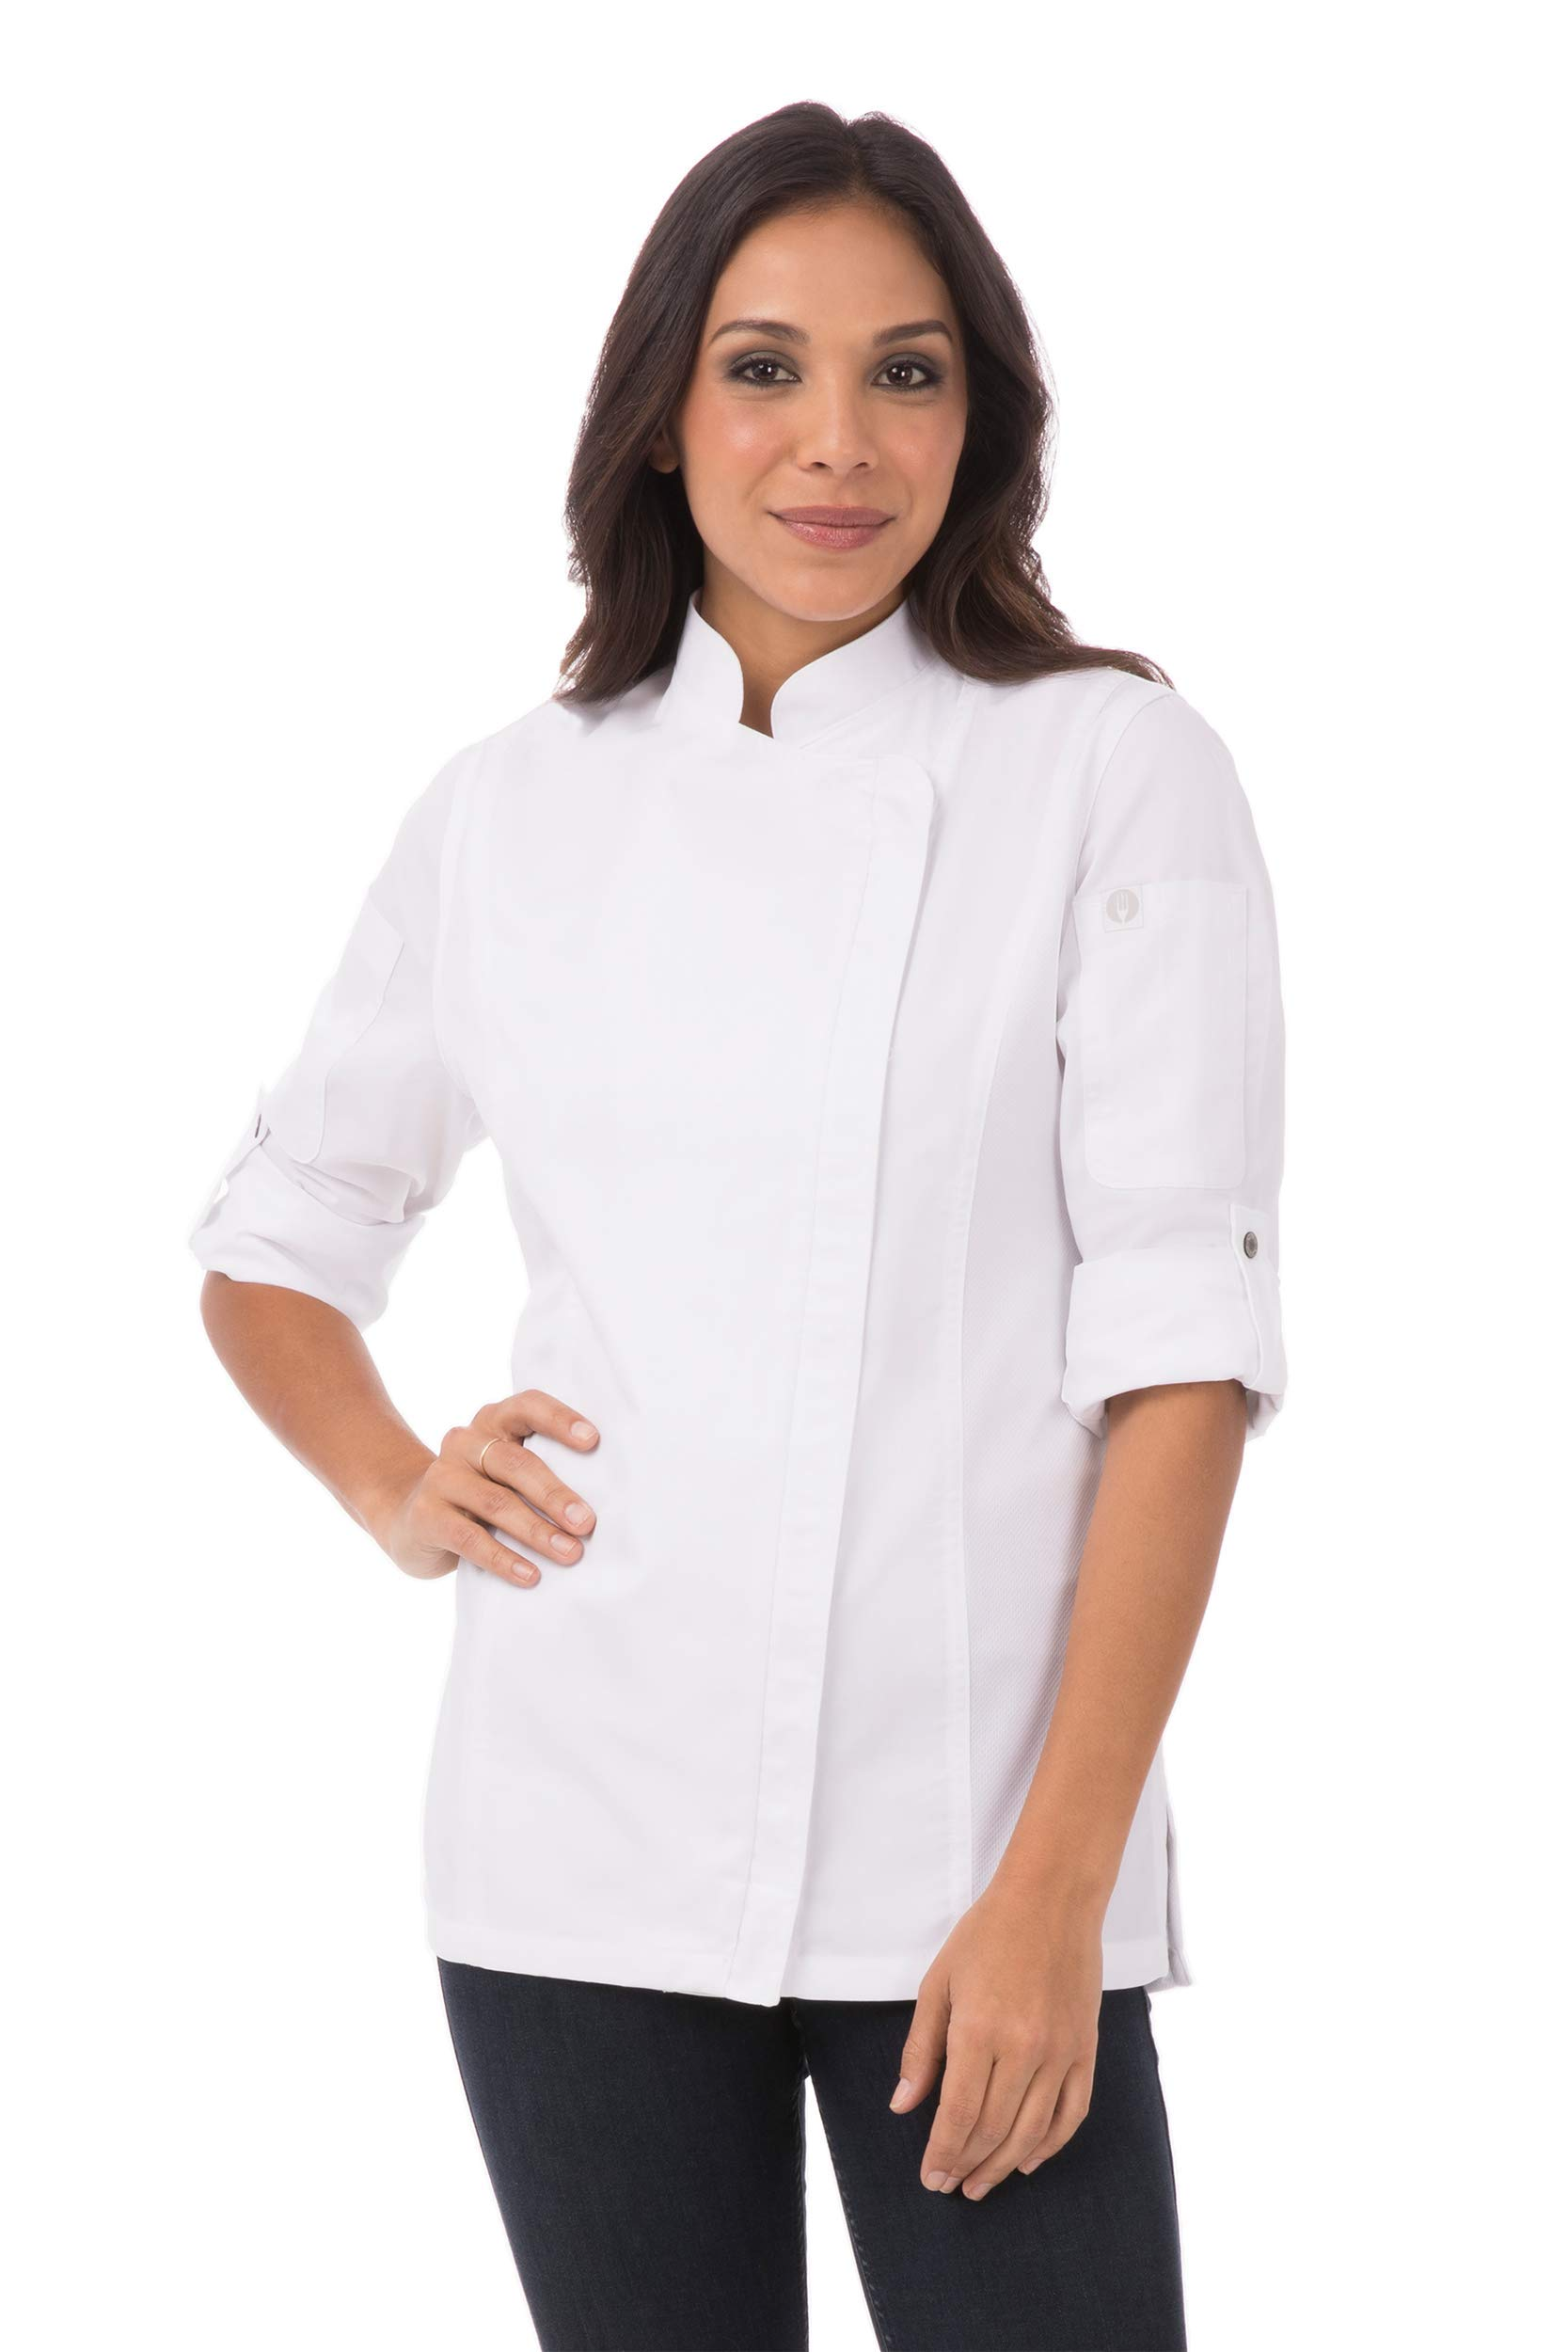 Chef Works Women's Hartford Chef Coat, White, Medium by Chef Works